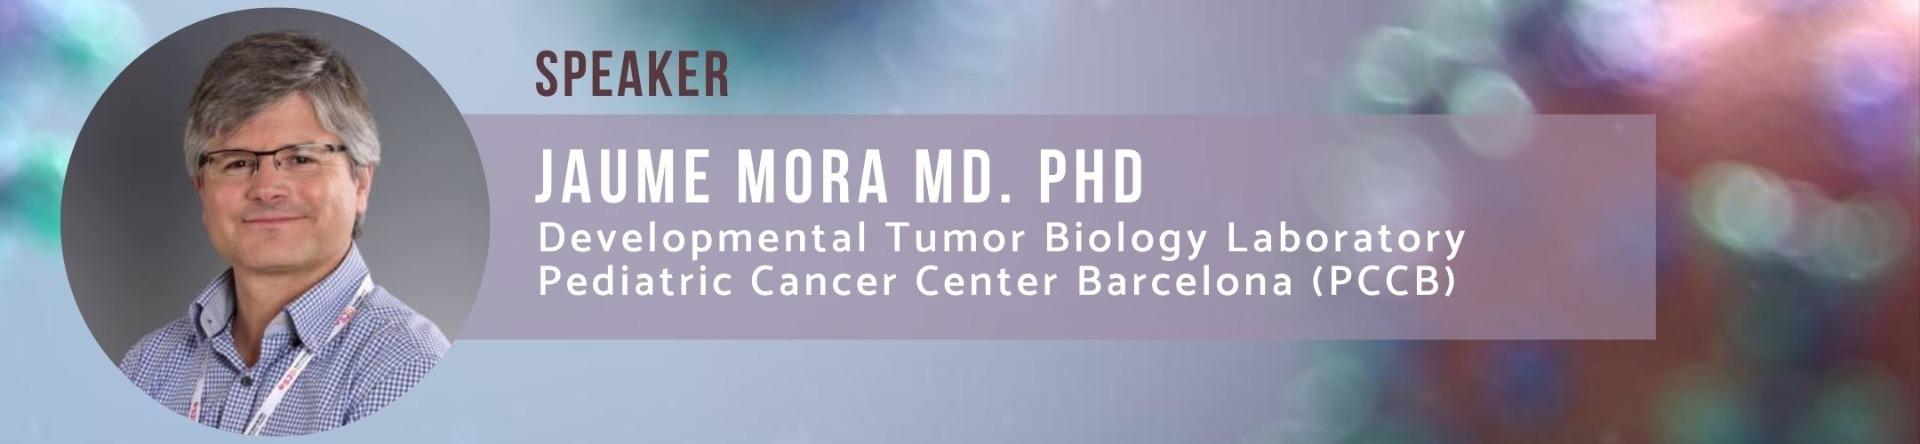 Jaume Mora Immunotherapy for neuroblastoma